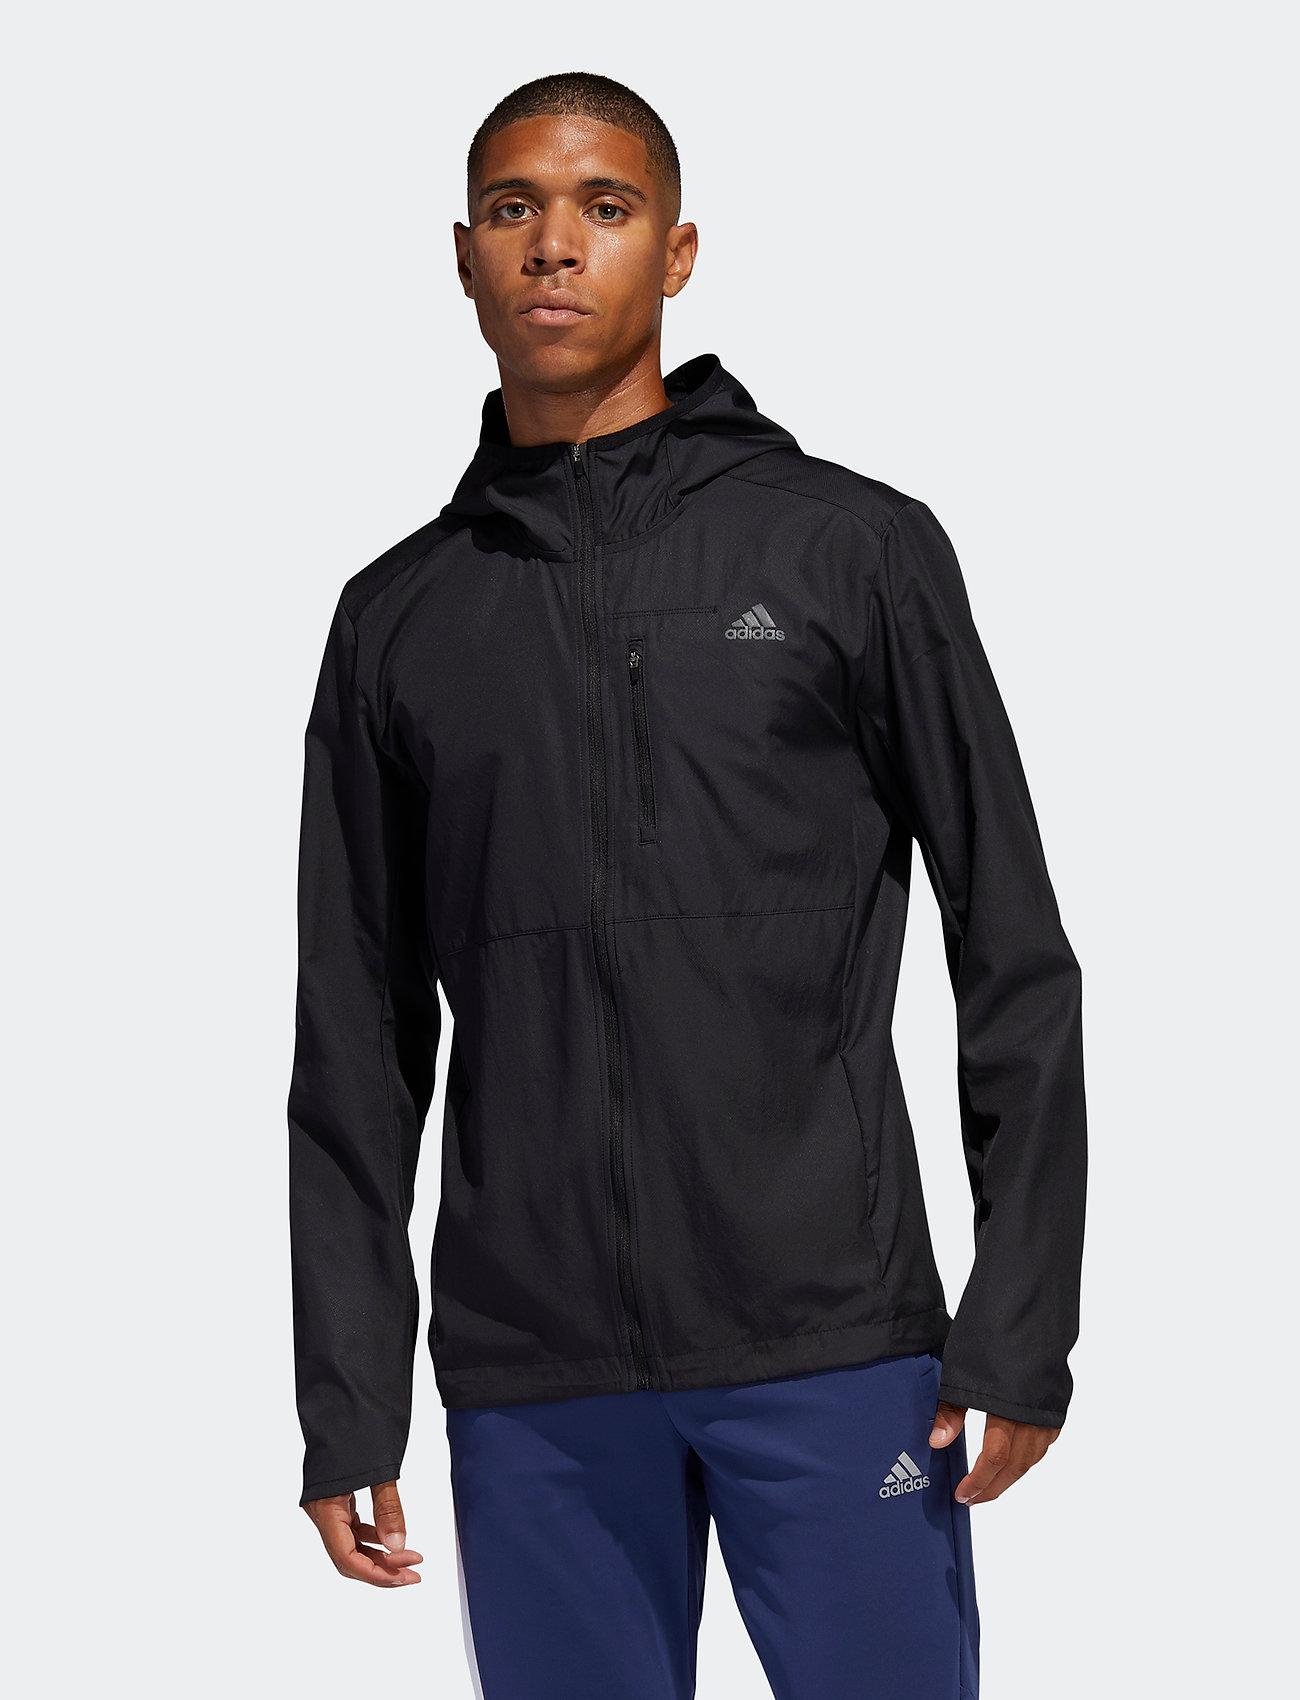 adidas Performance - OWN THE RUN JKT - training jackets - black - 0